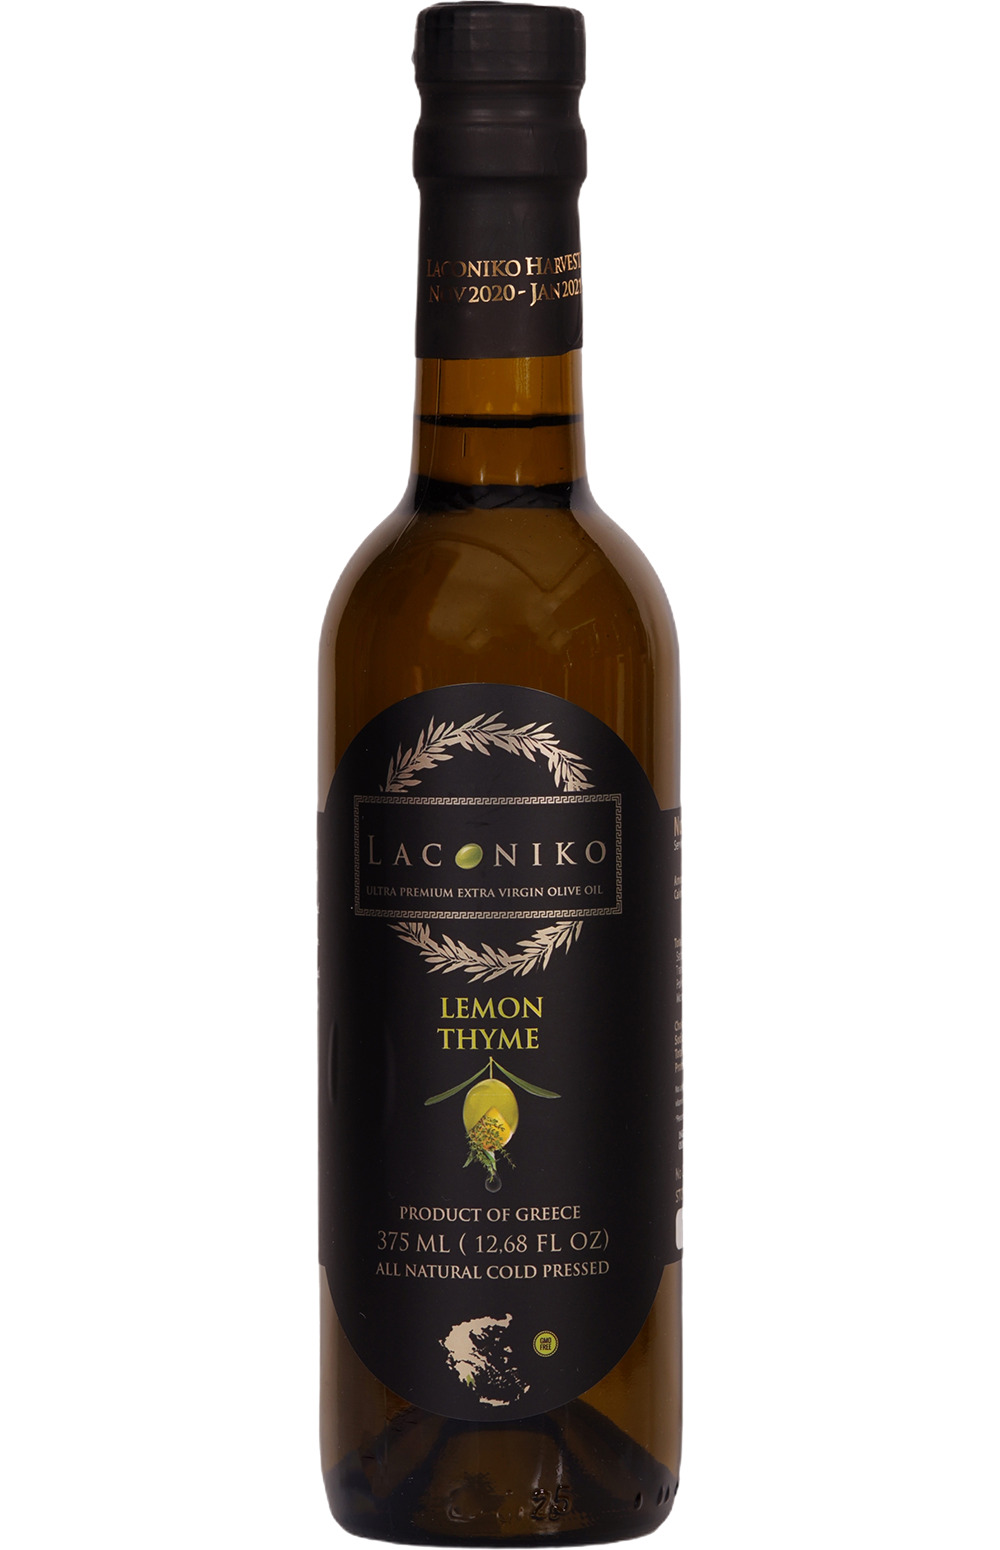 Laconico Lemon Thyme